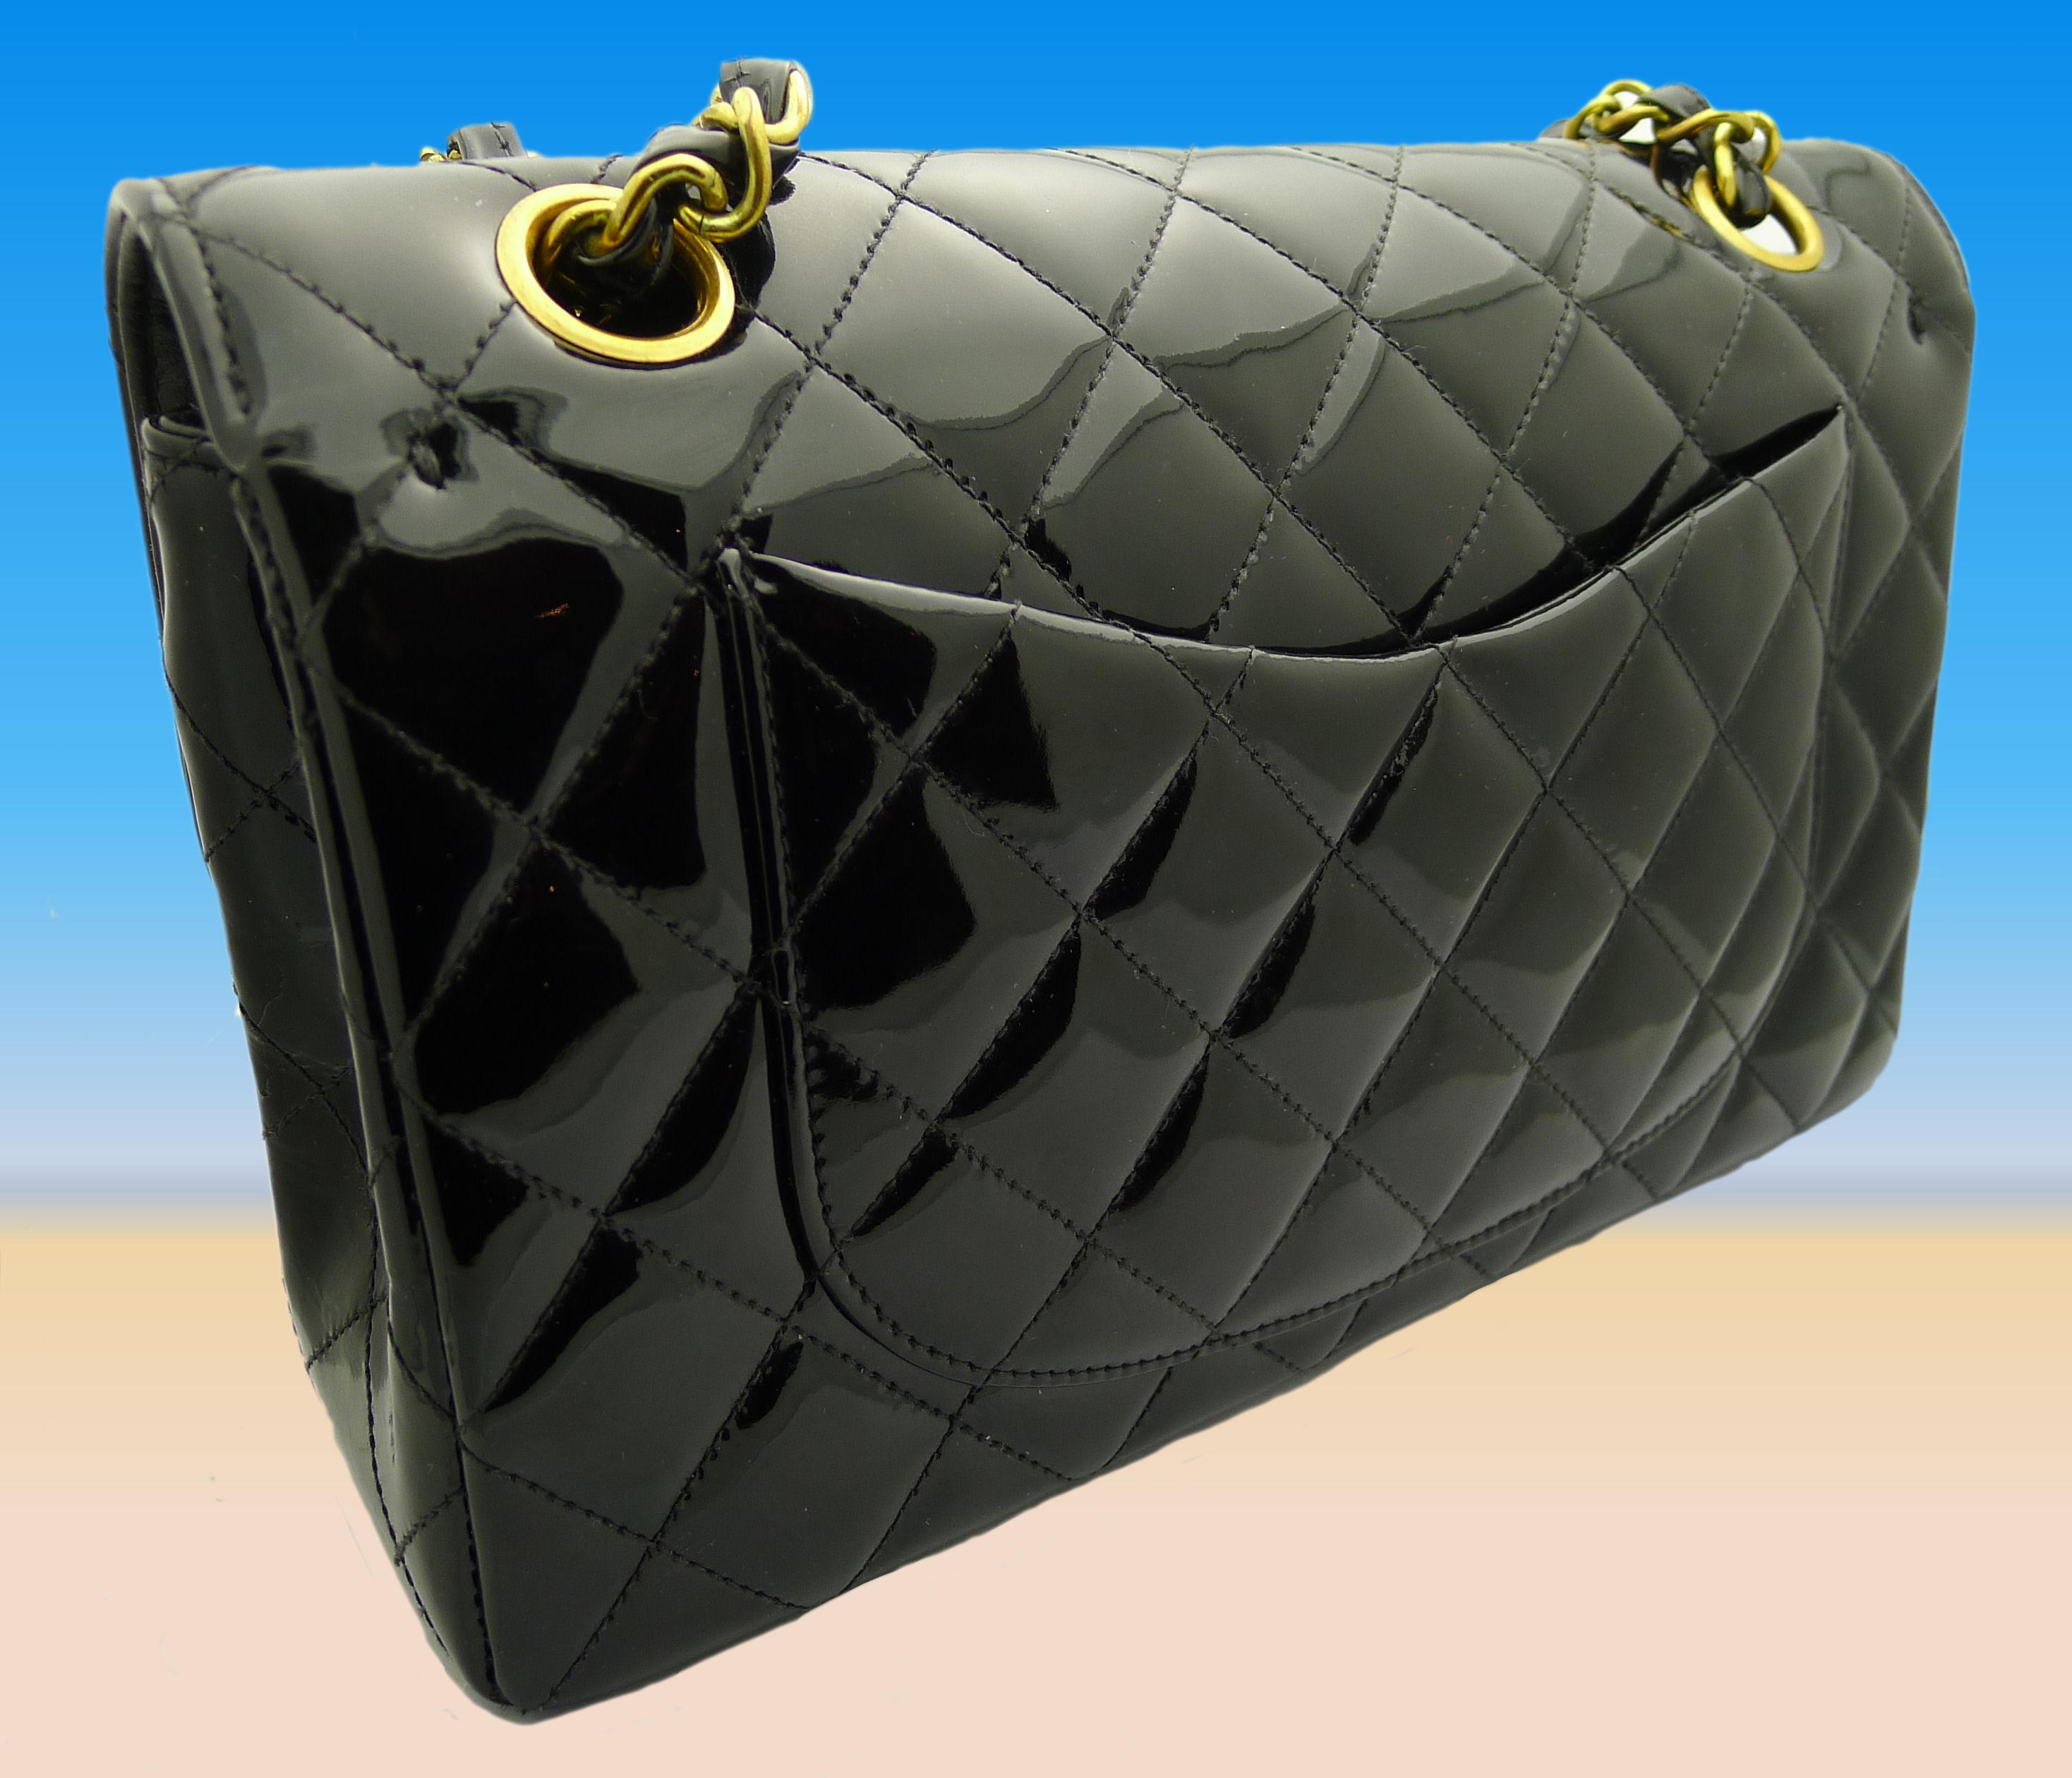 chanel tasche handtasche schwarz lackleder ebay. Black Bedroom Furniture Sets. Home Design Ideas